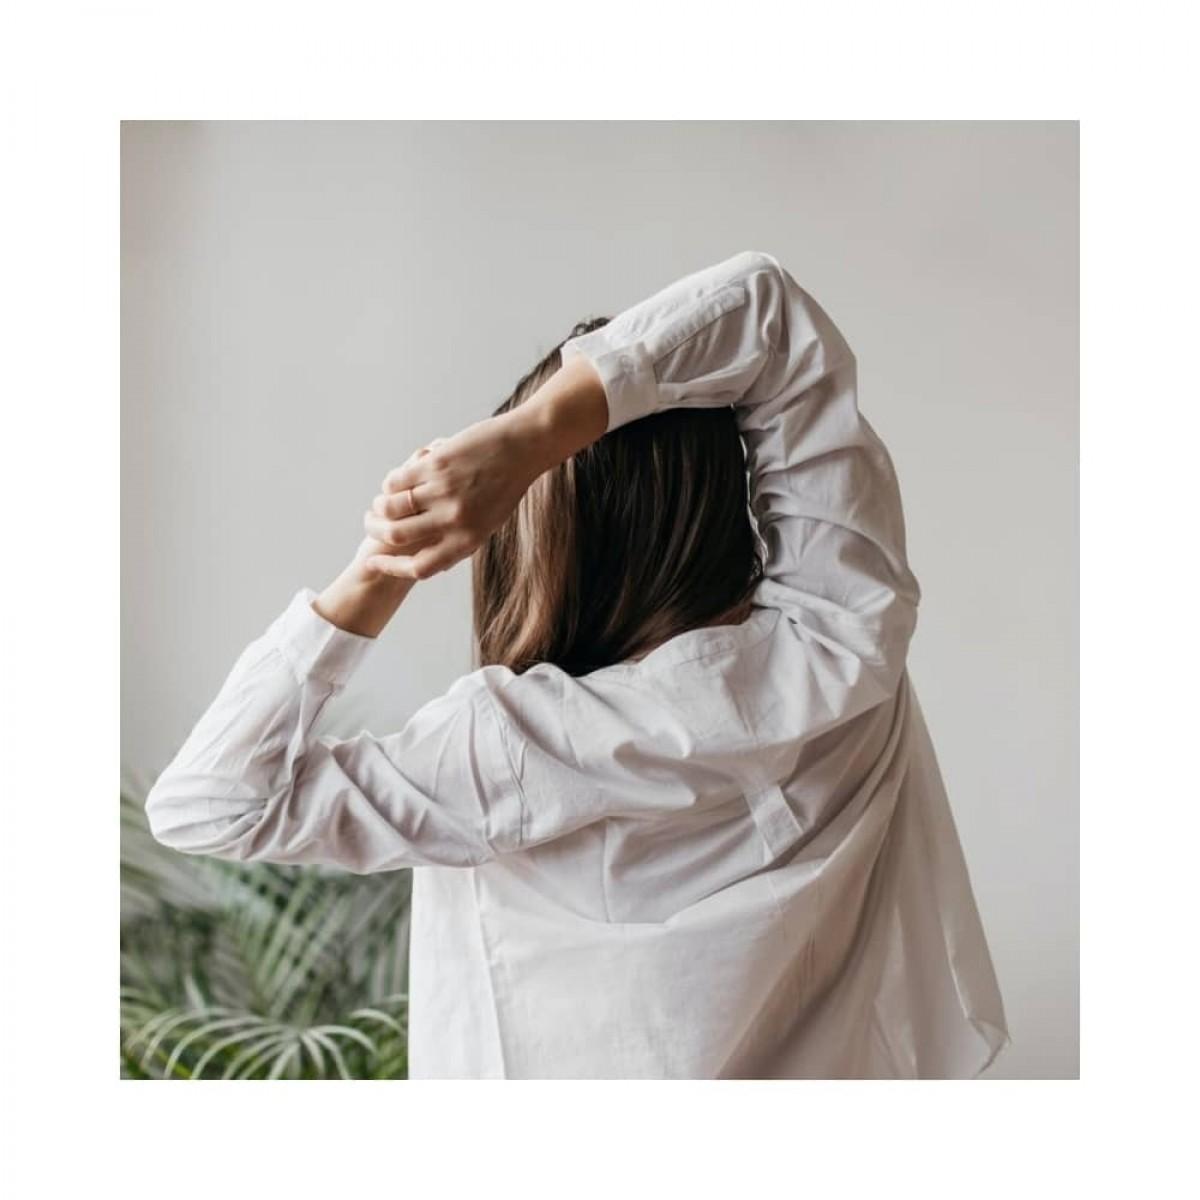 woodie skjorte - white - yoga bagfra